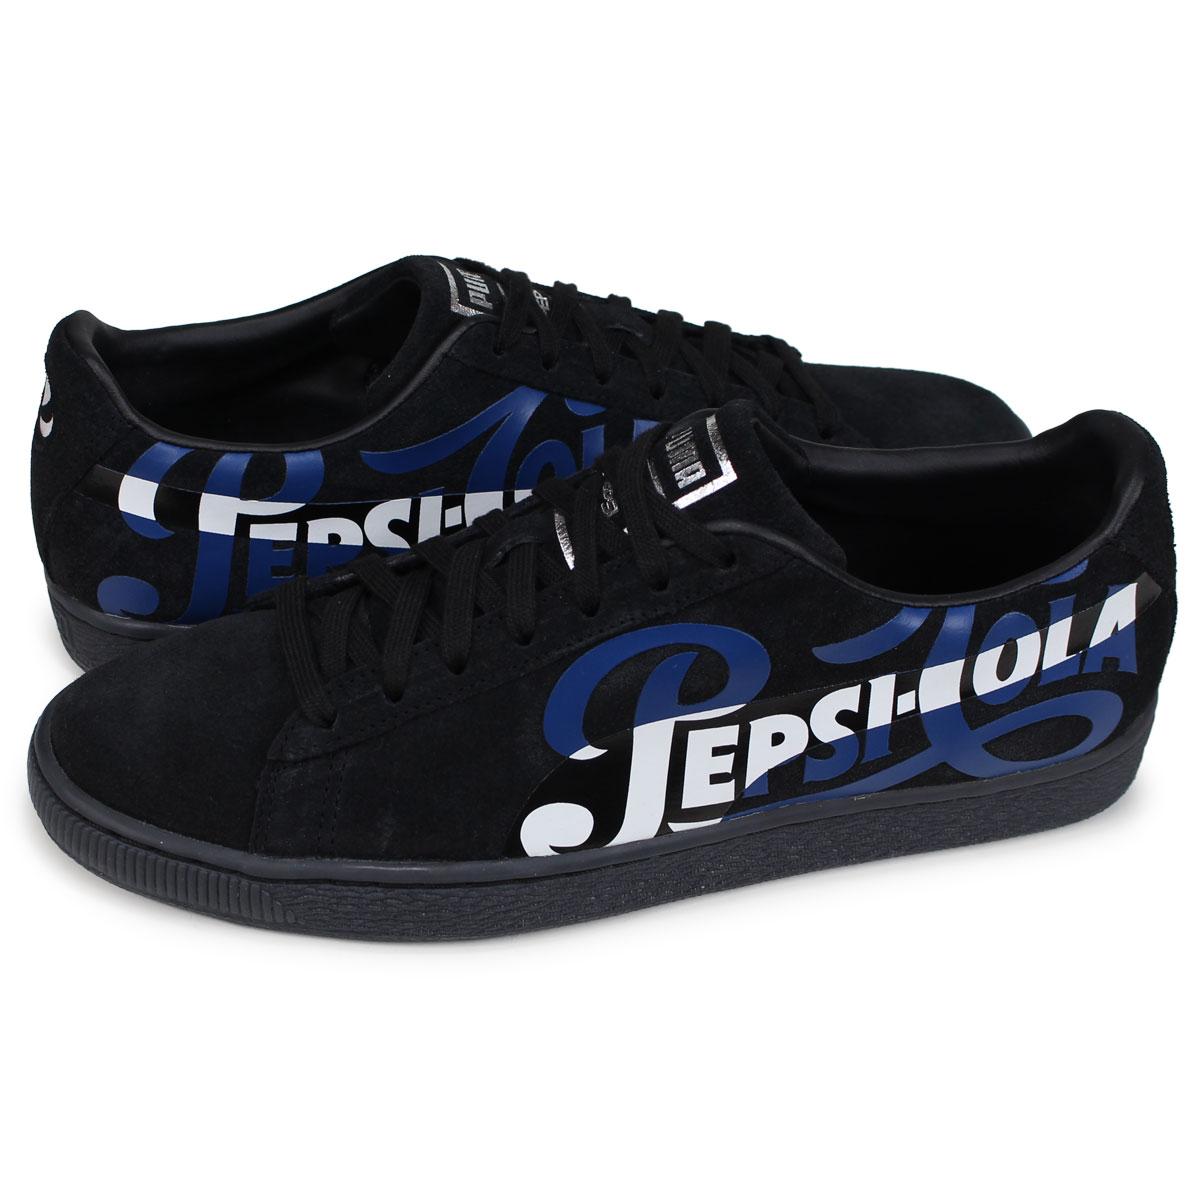 size 40 89ba9 690a3 PUMA SUEDE CLASSIC Puma suede cloth classical music sneakers men PepsiCo  laboratory PEPSI black 366,332-02